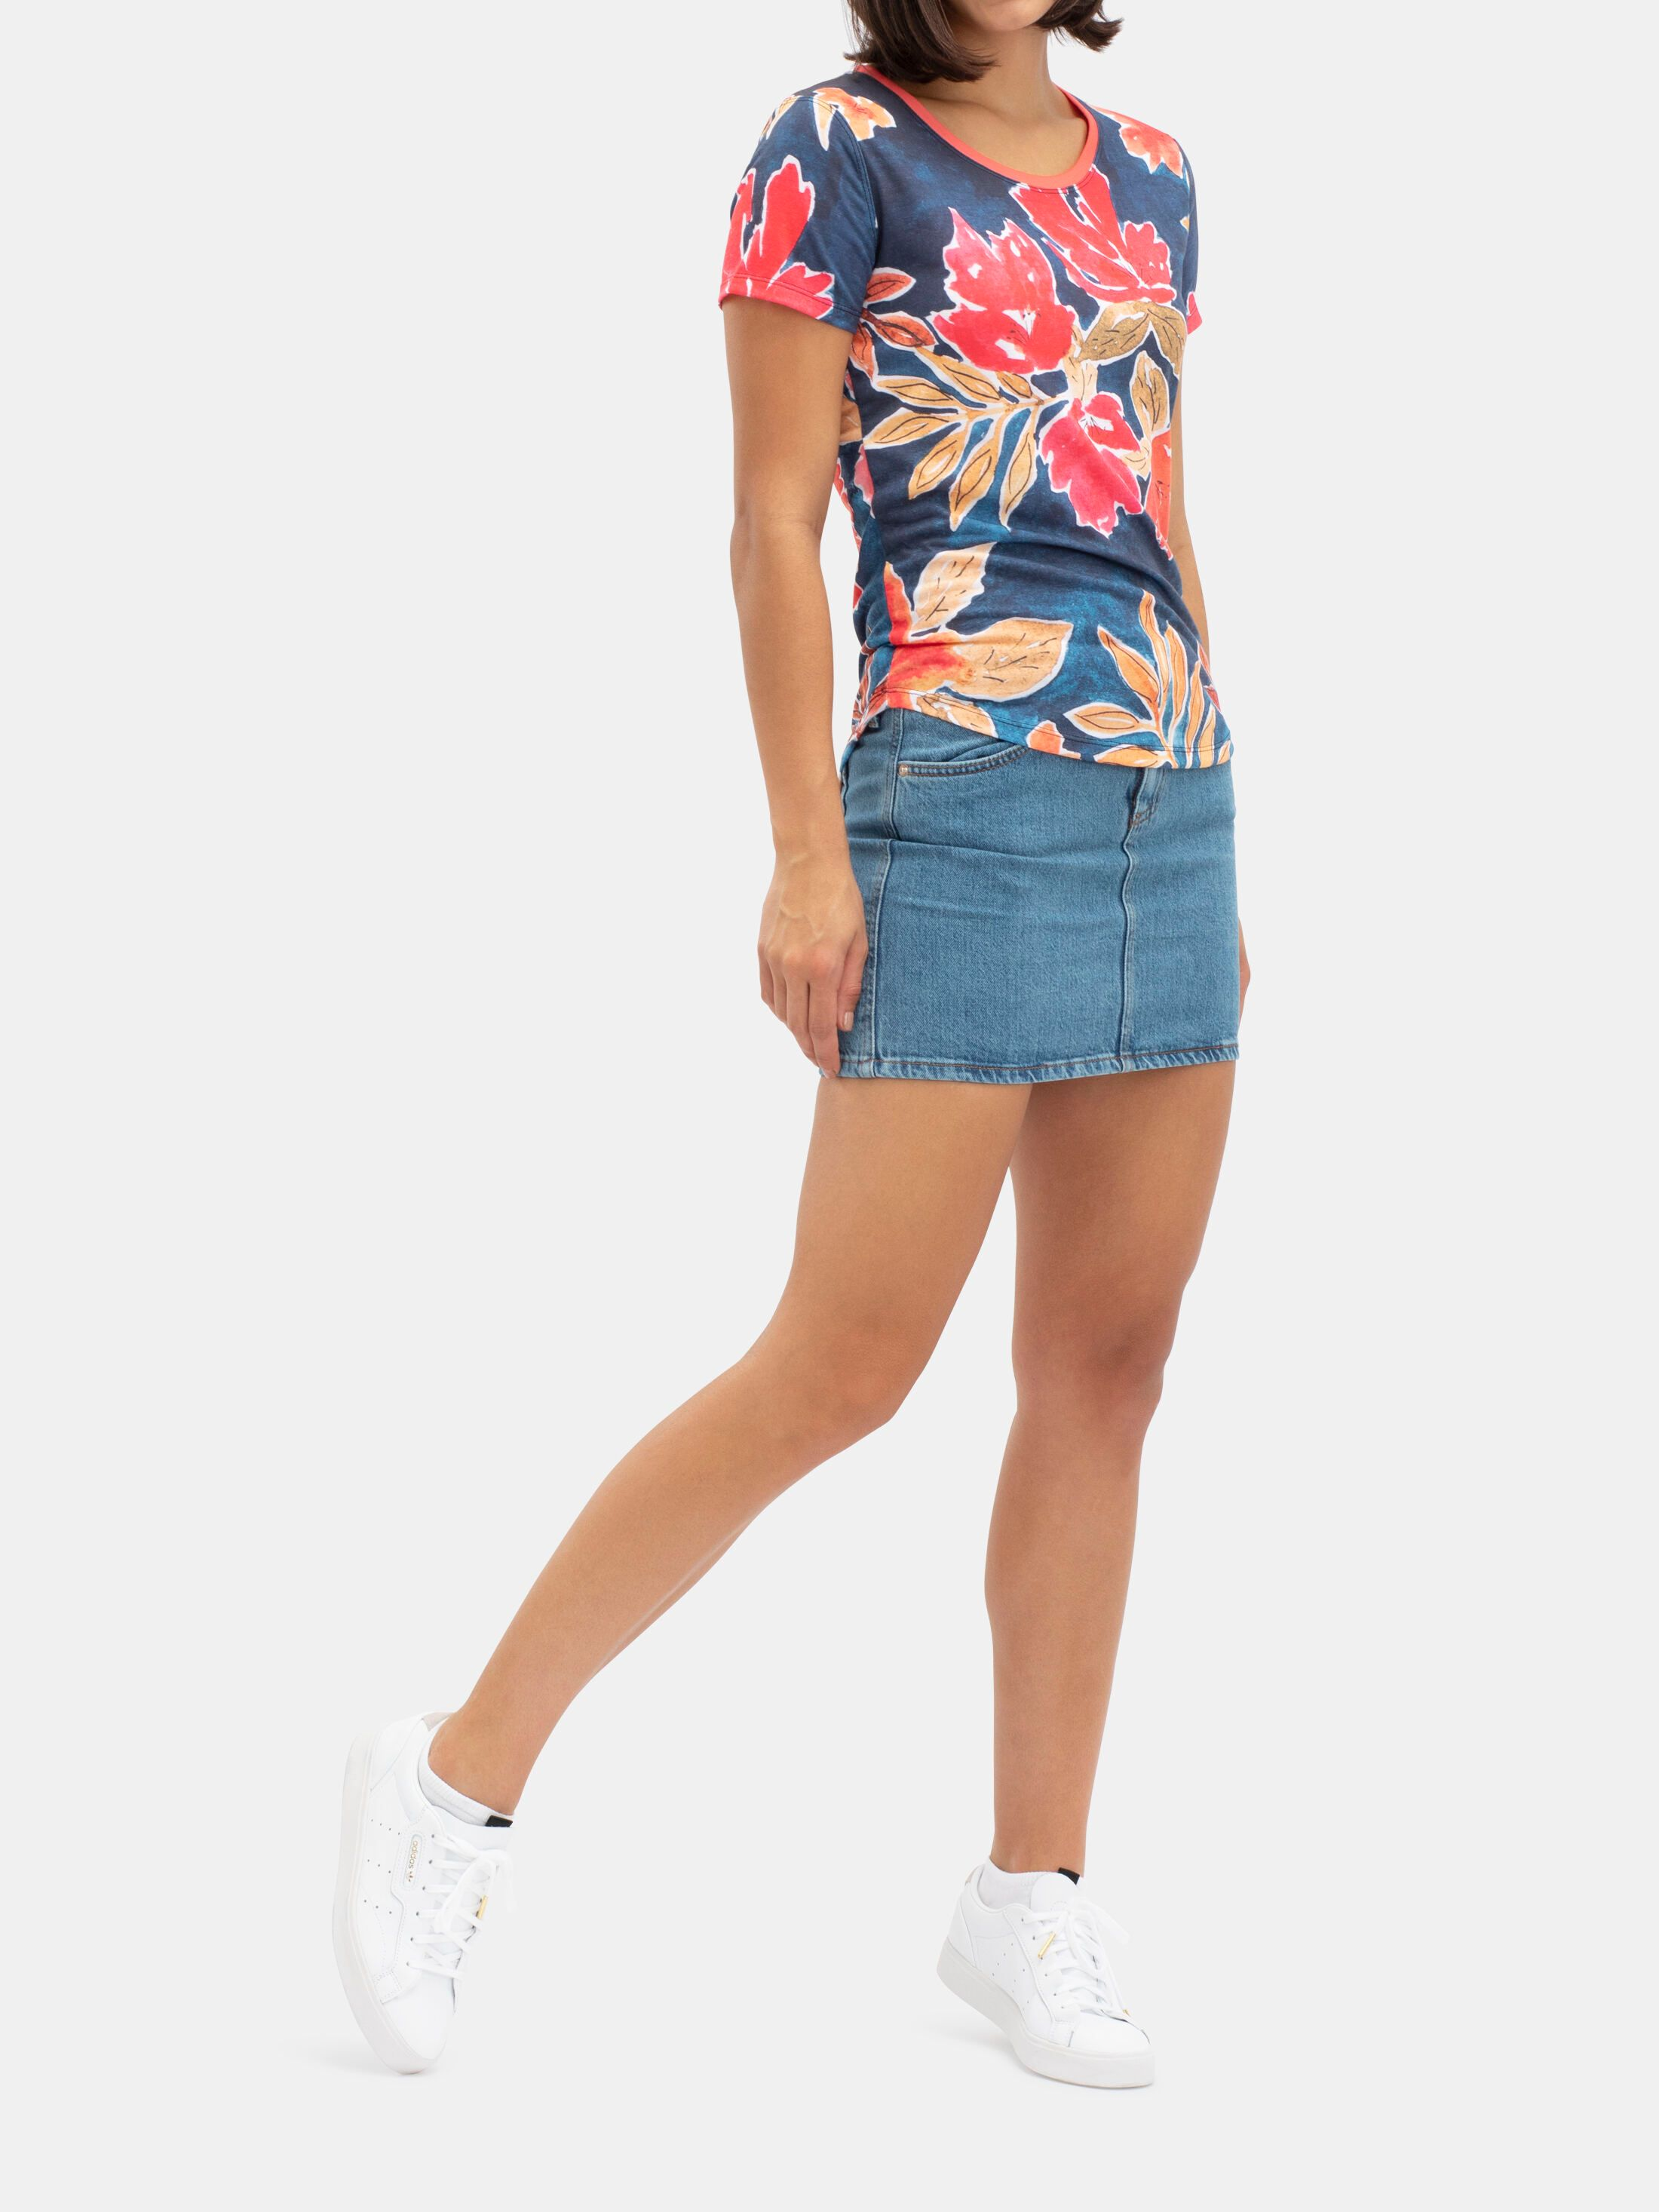 Women's Custom Slim Fit T-Shirt